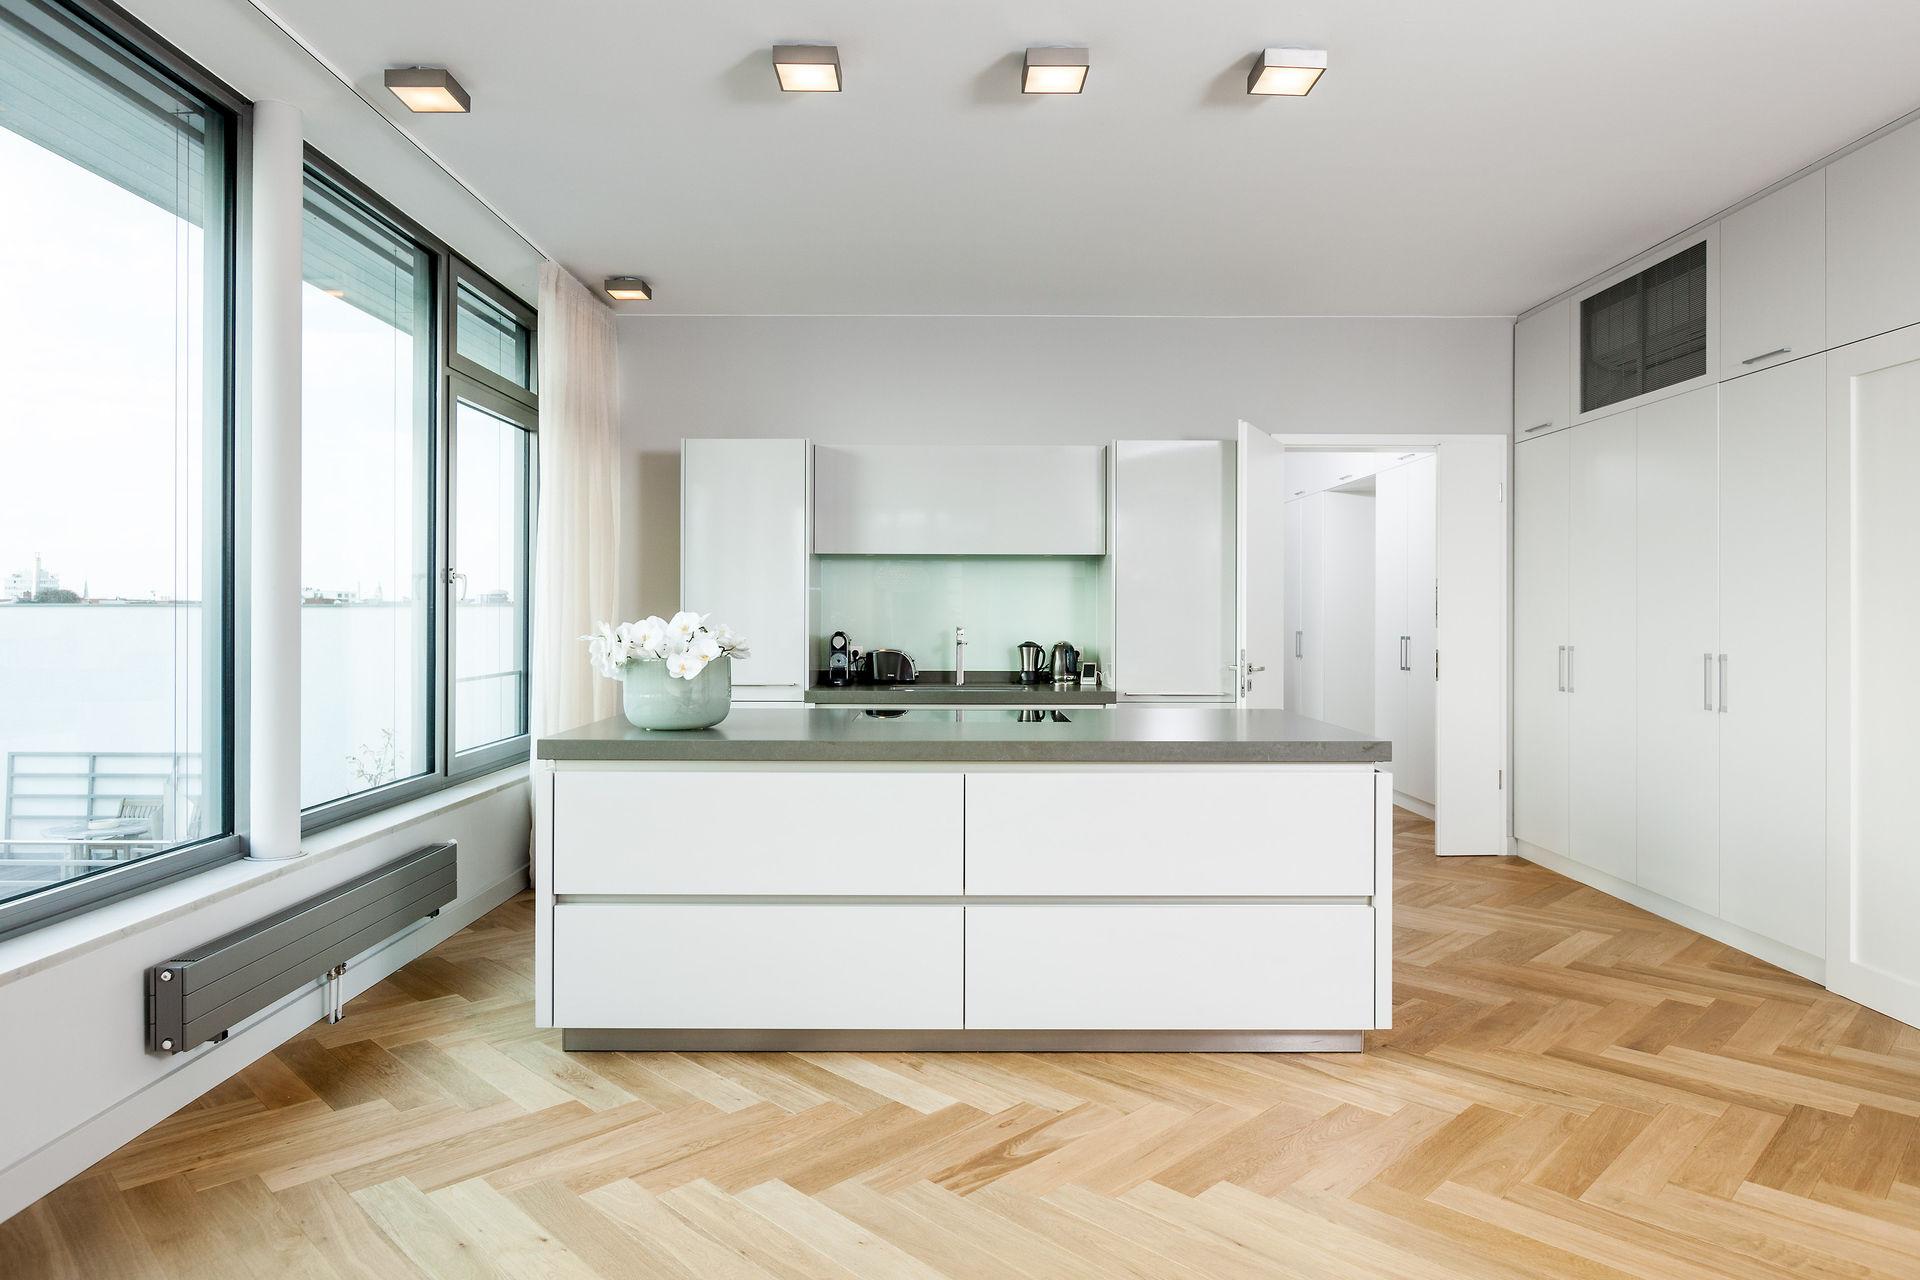 luxus penthouse in ruhiger kurf rstendamm seitenstra e farawayhome. Black Bedroom Furniture Sets. Home Design Ideas